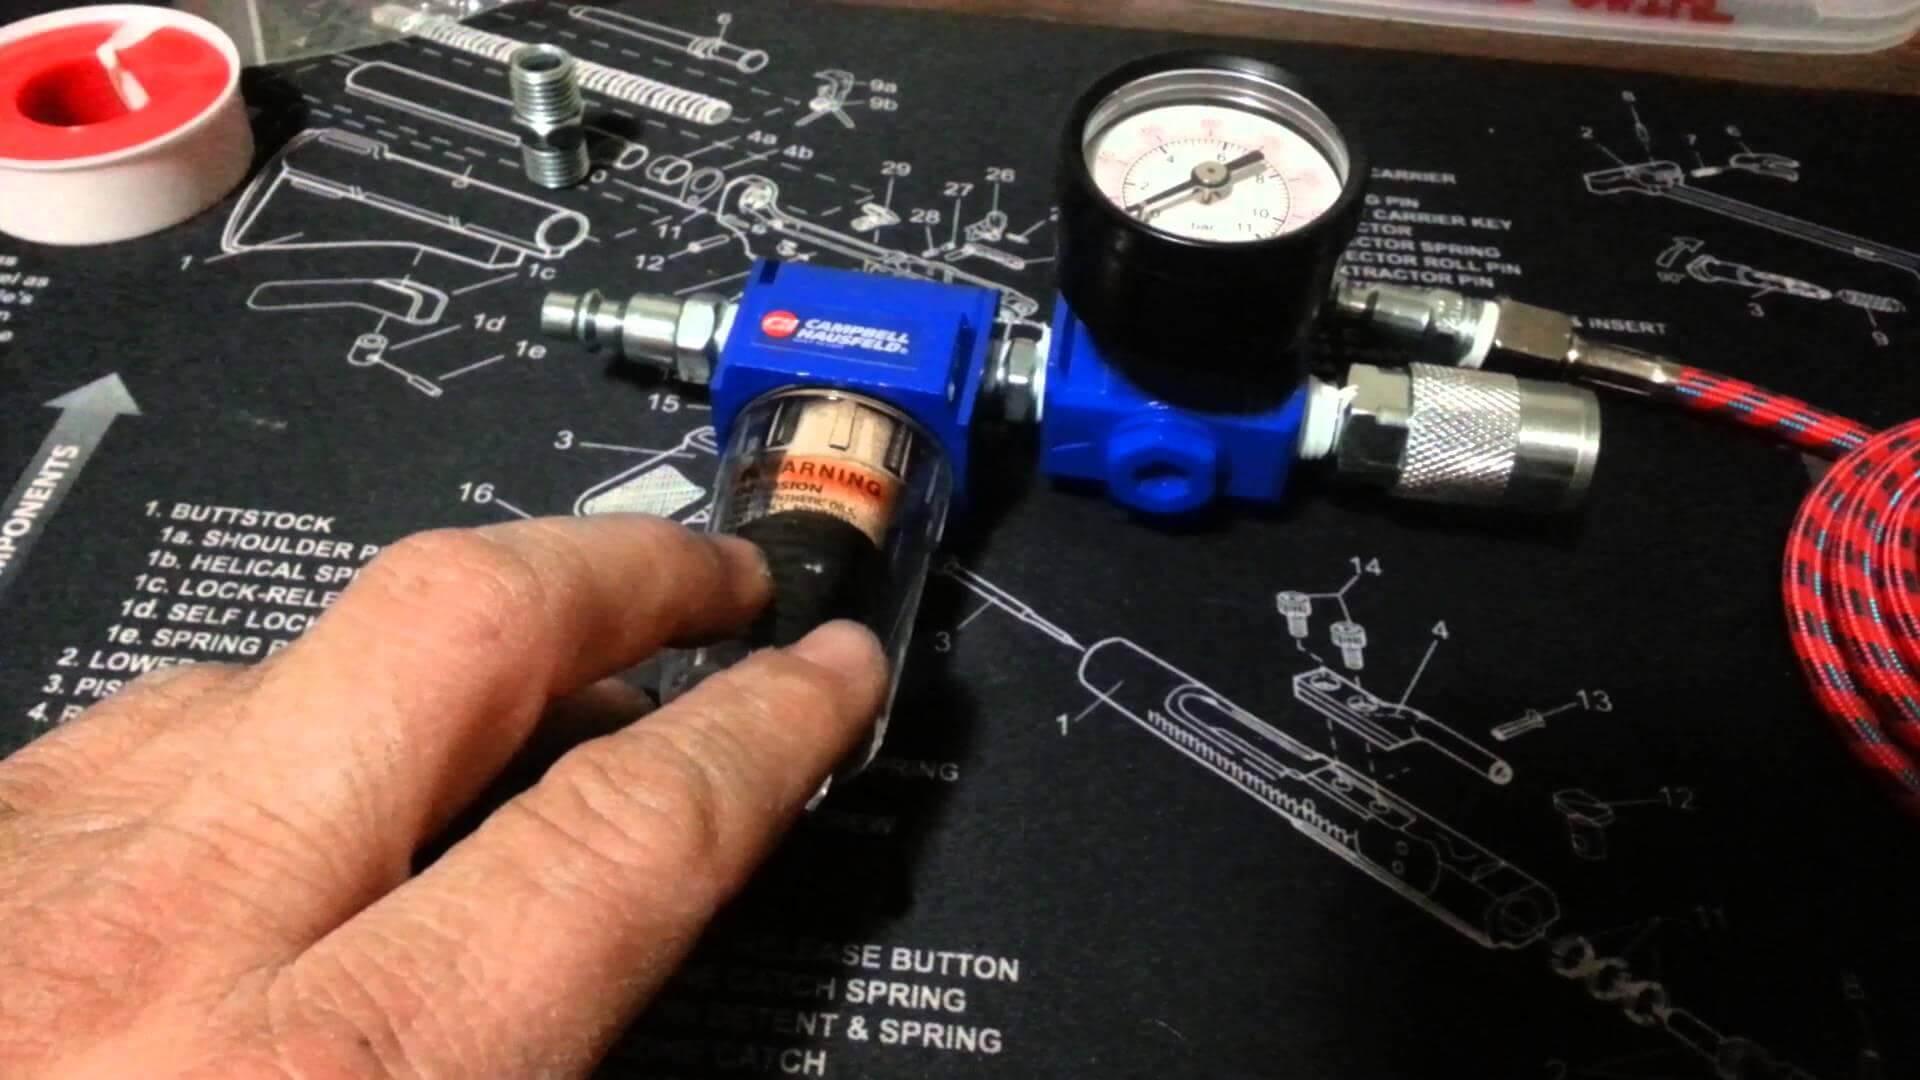 foundation airbrush compressor